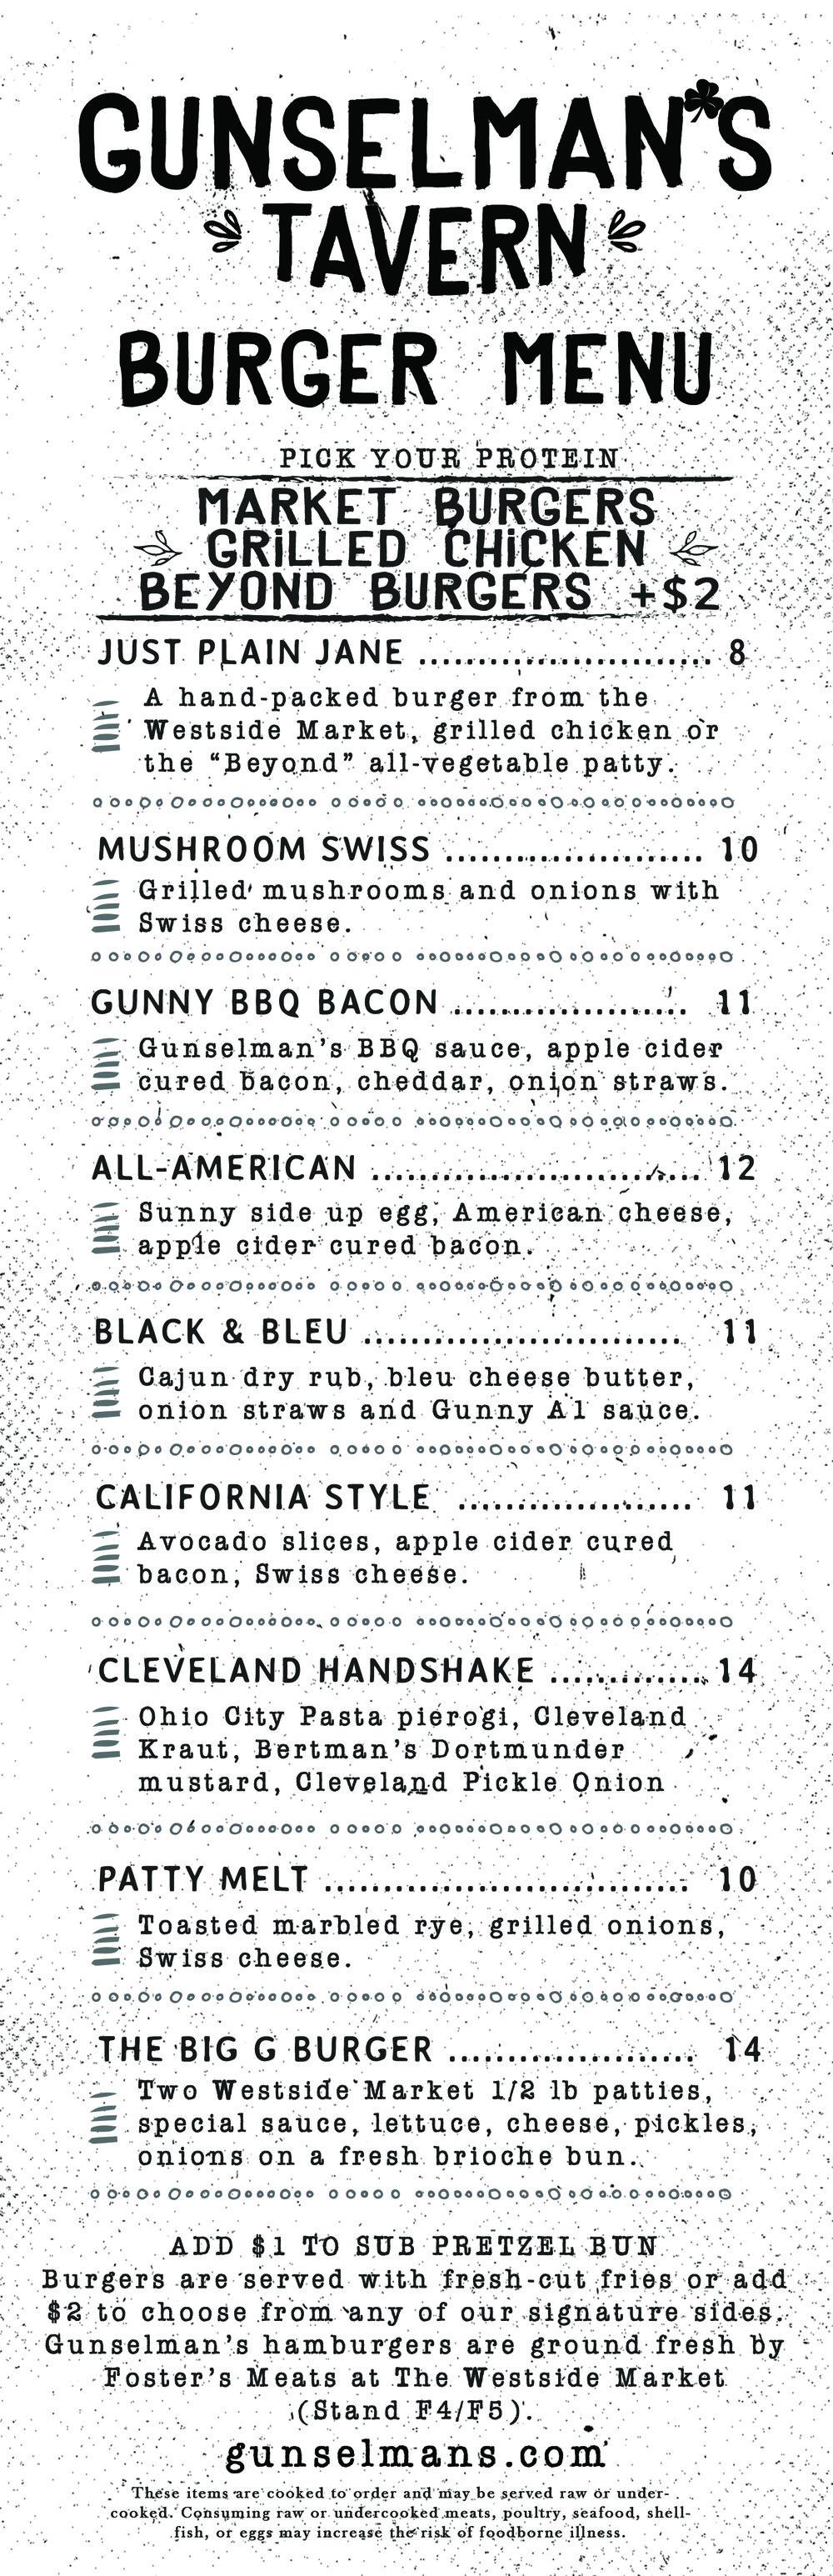 burger menu 103118 jpg.jpg